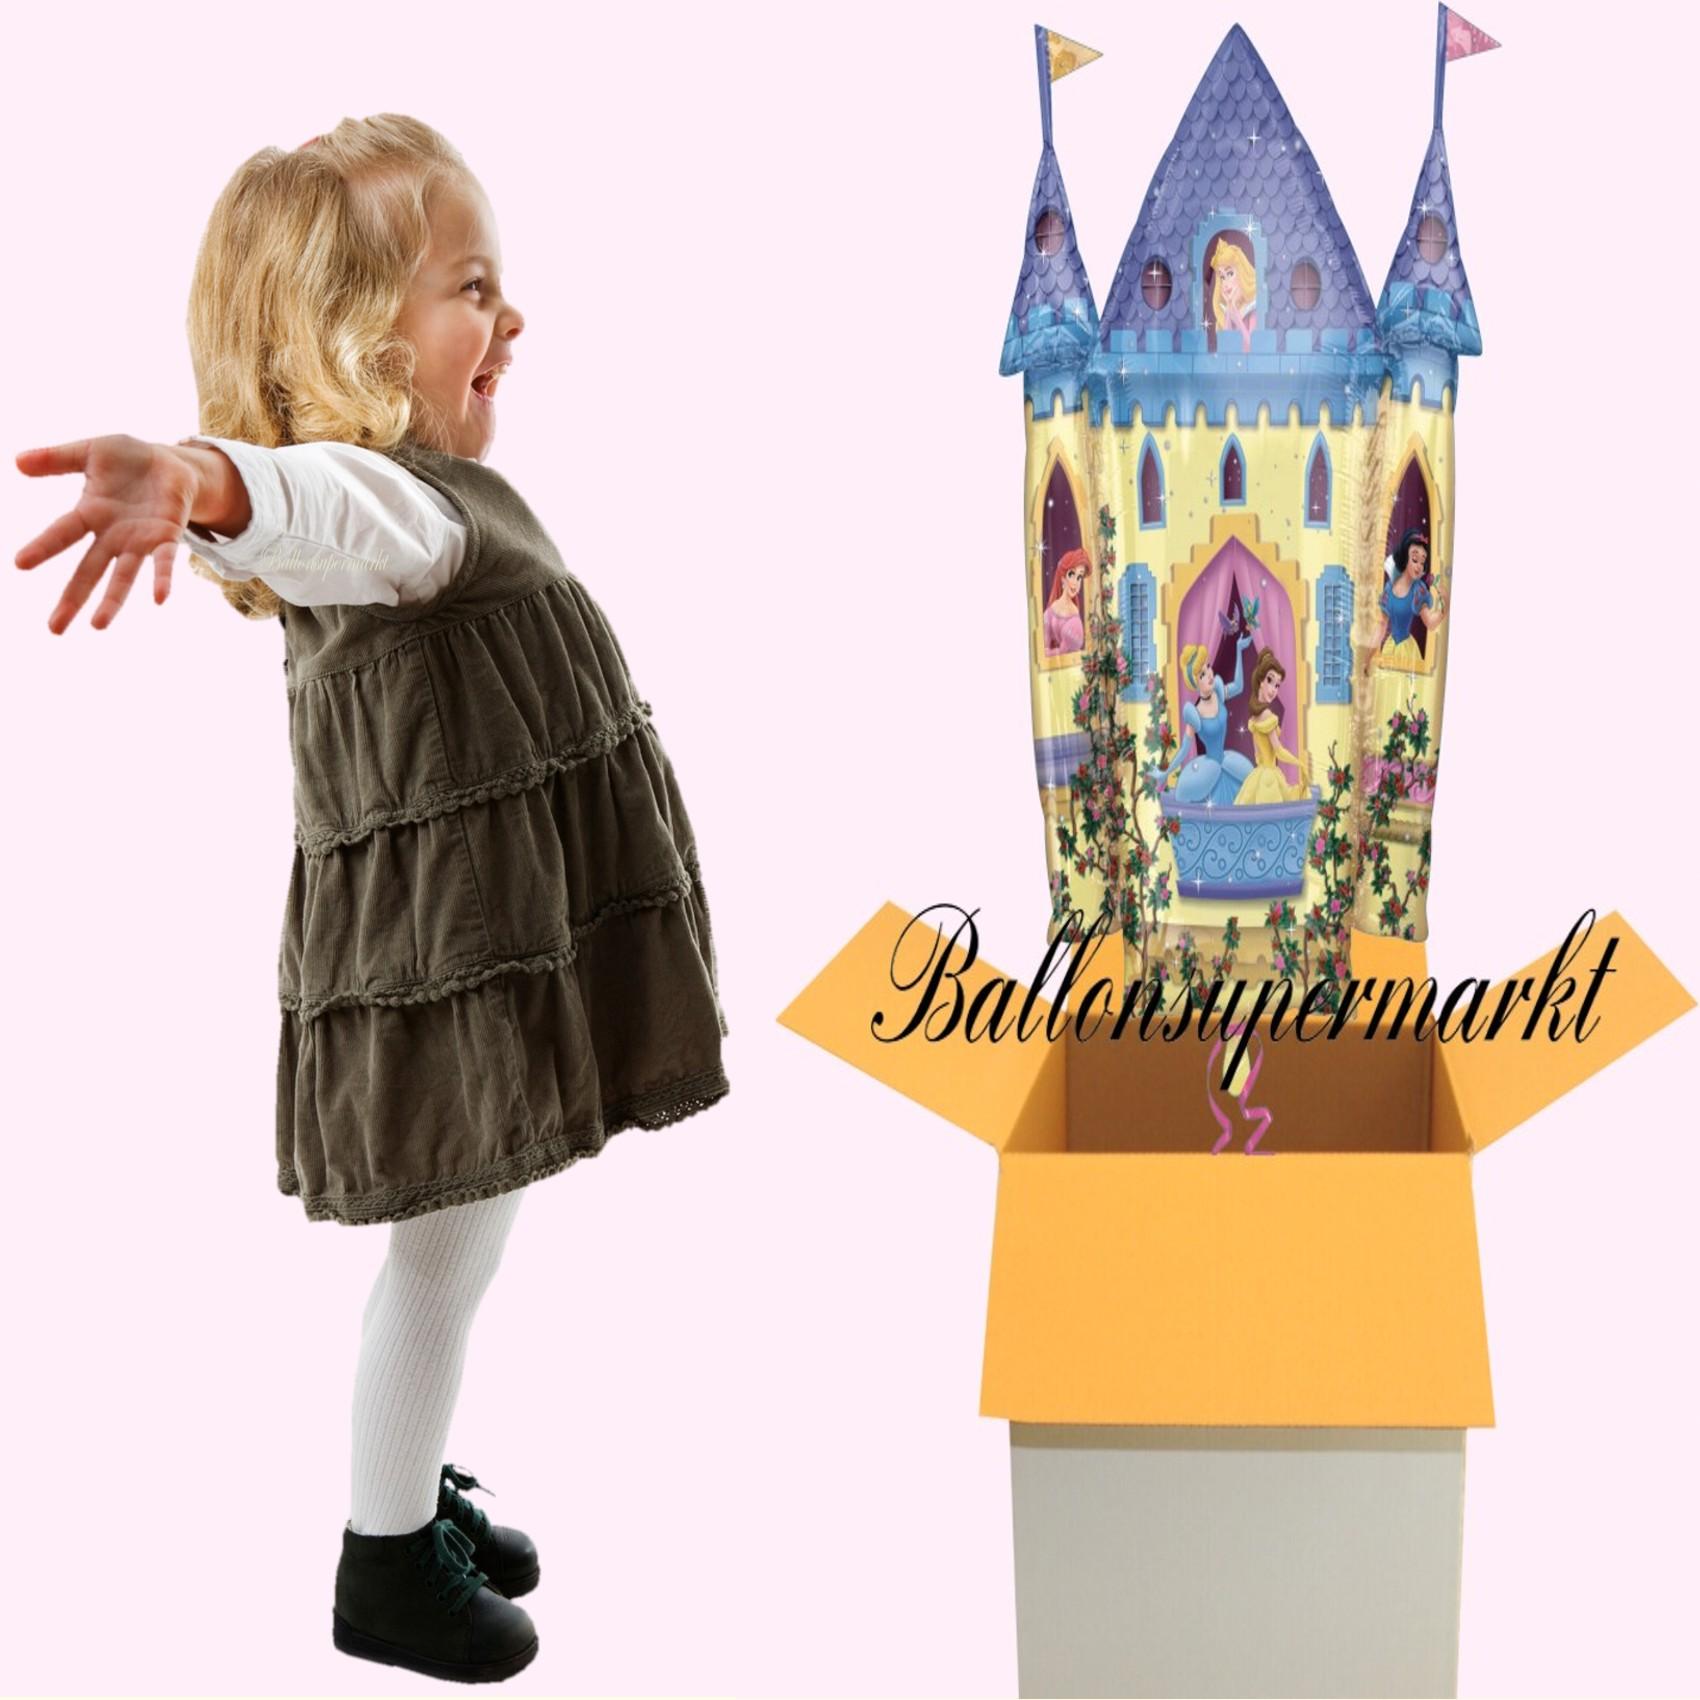 luftballon disney princess castle prinzessinnen schloss shape kindergeburtstag u geschenk lu. Black Bedroom Furniture Sets. Home Design Ideas